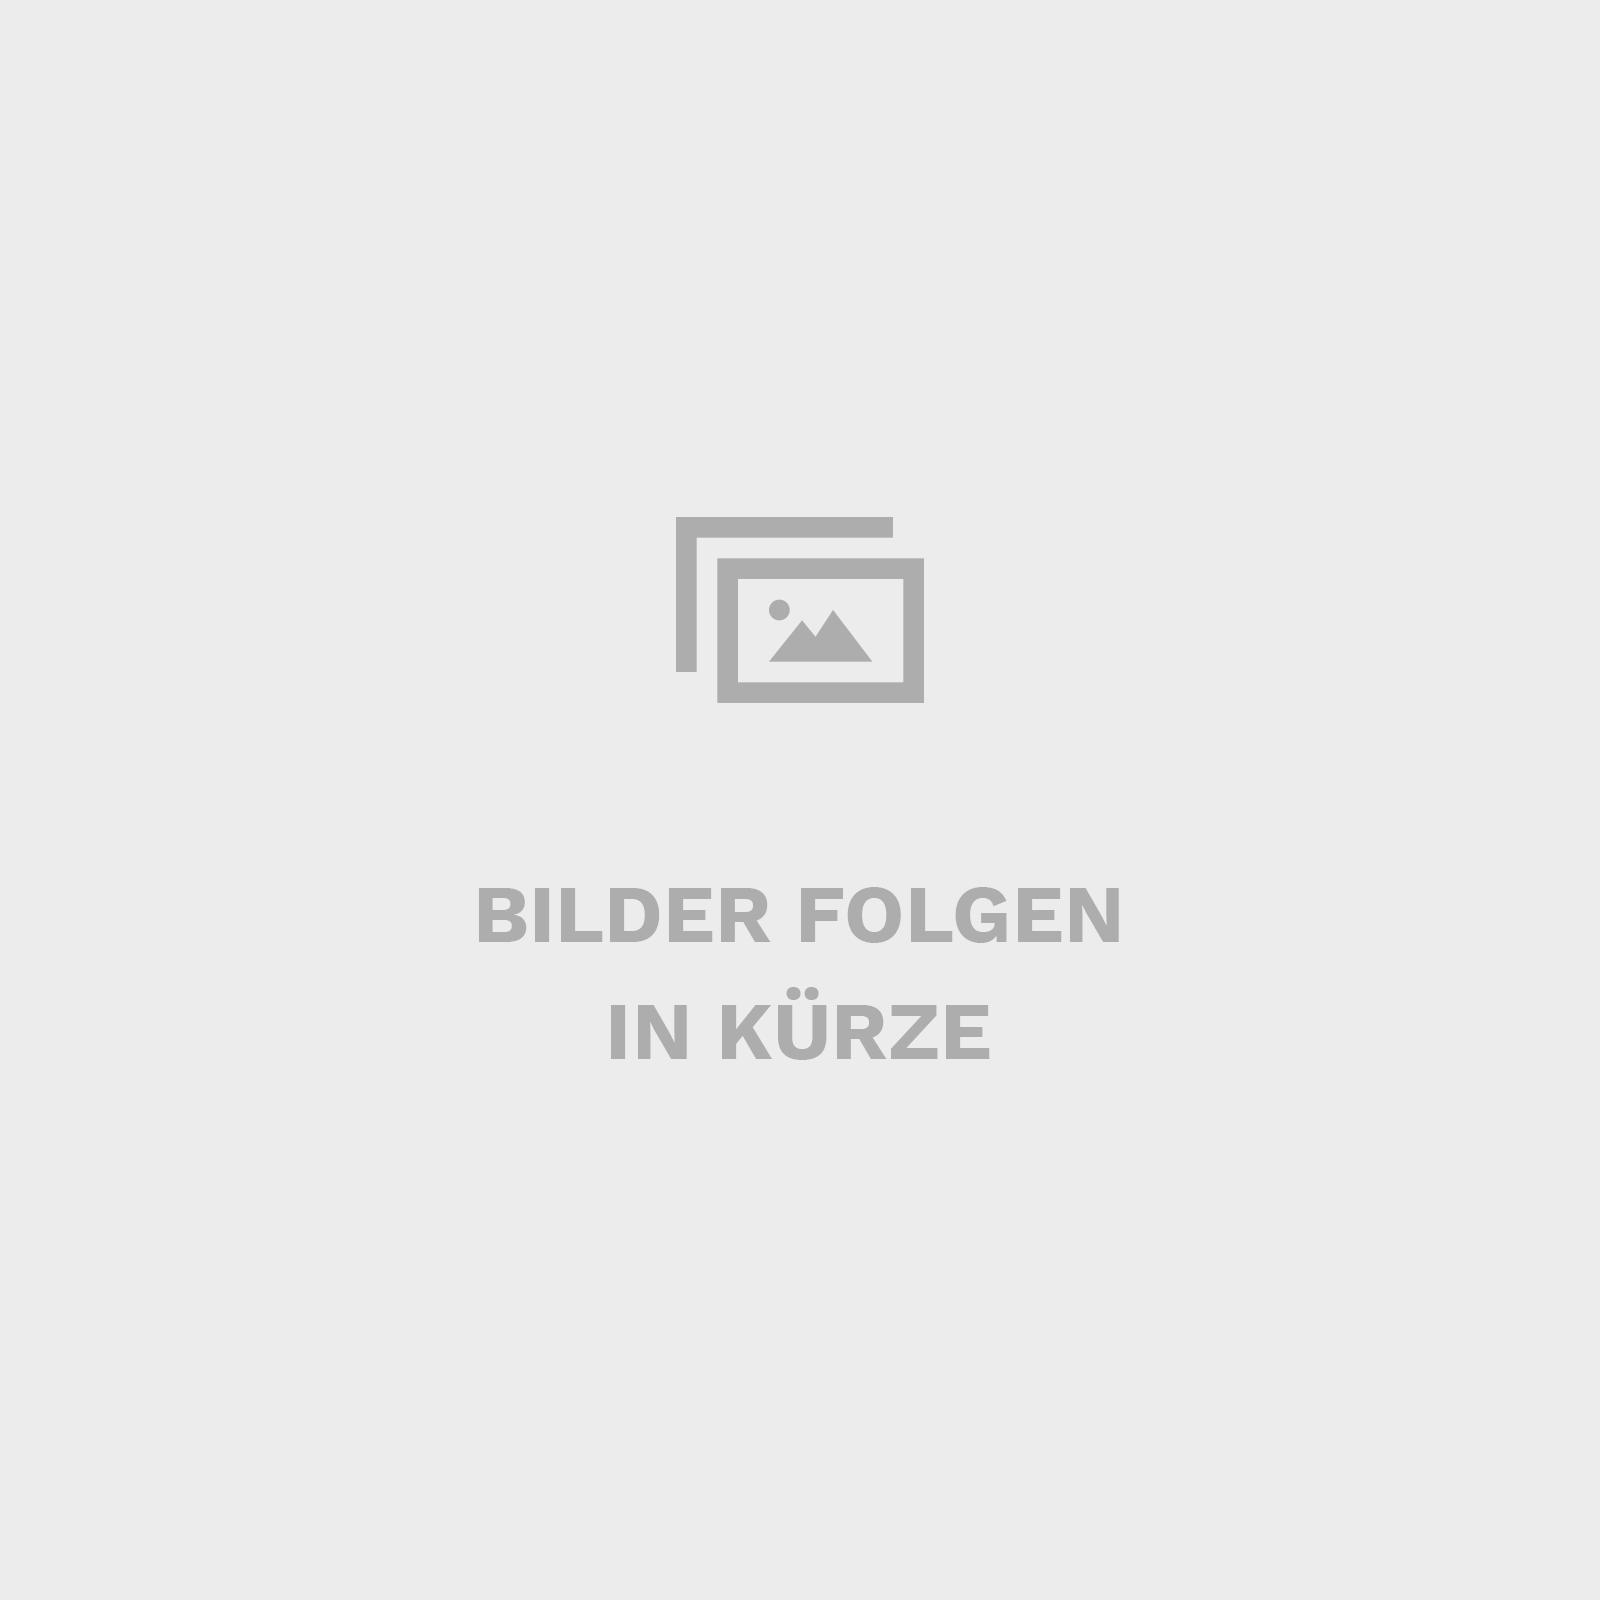 Farbe 02 - gebrochenem weiß